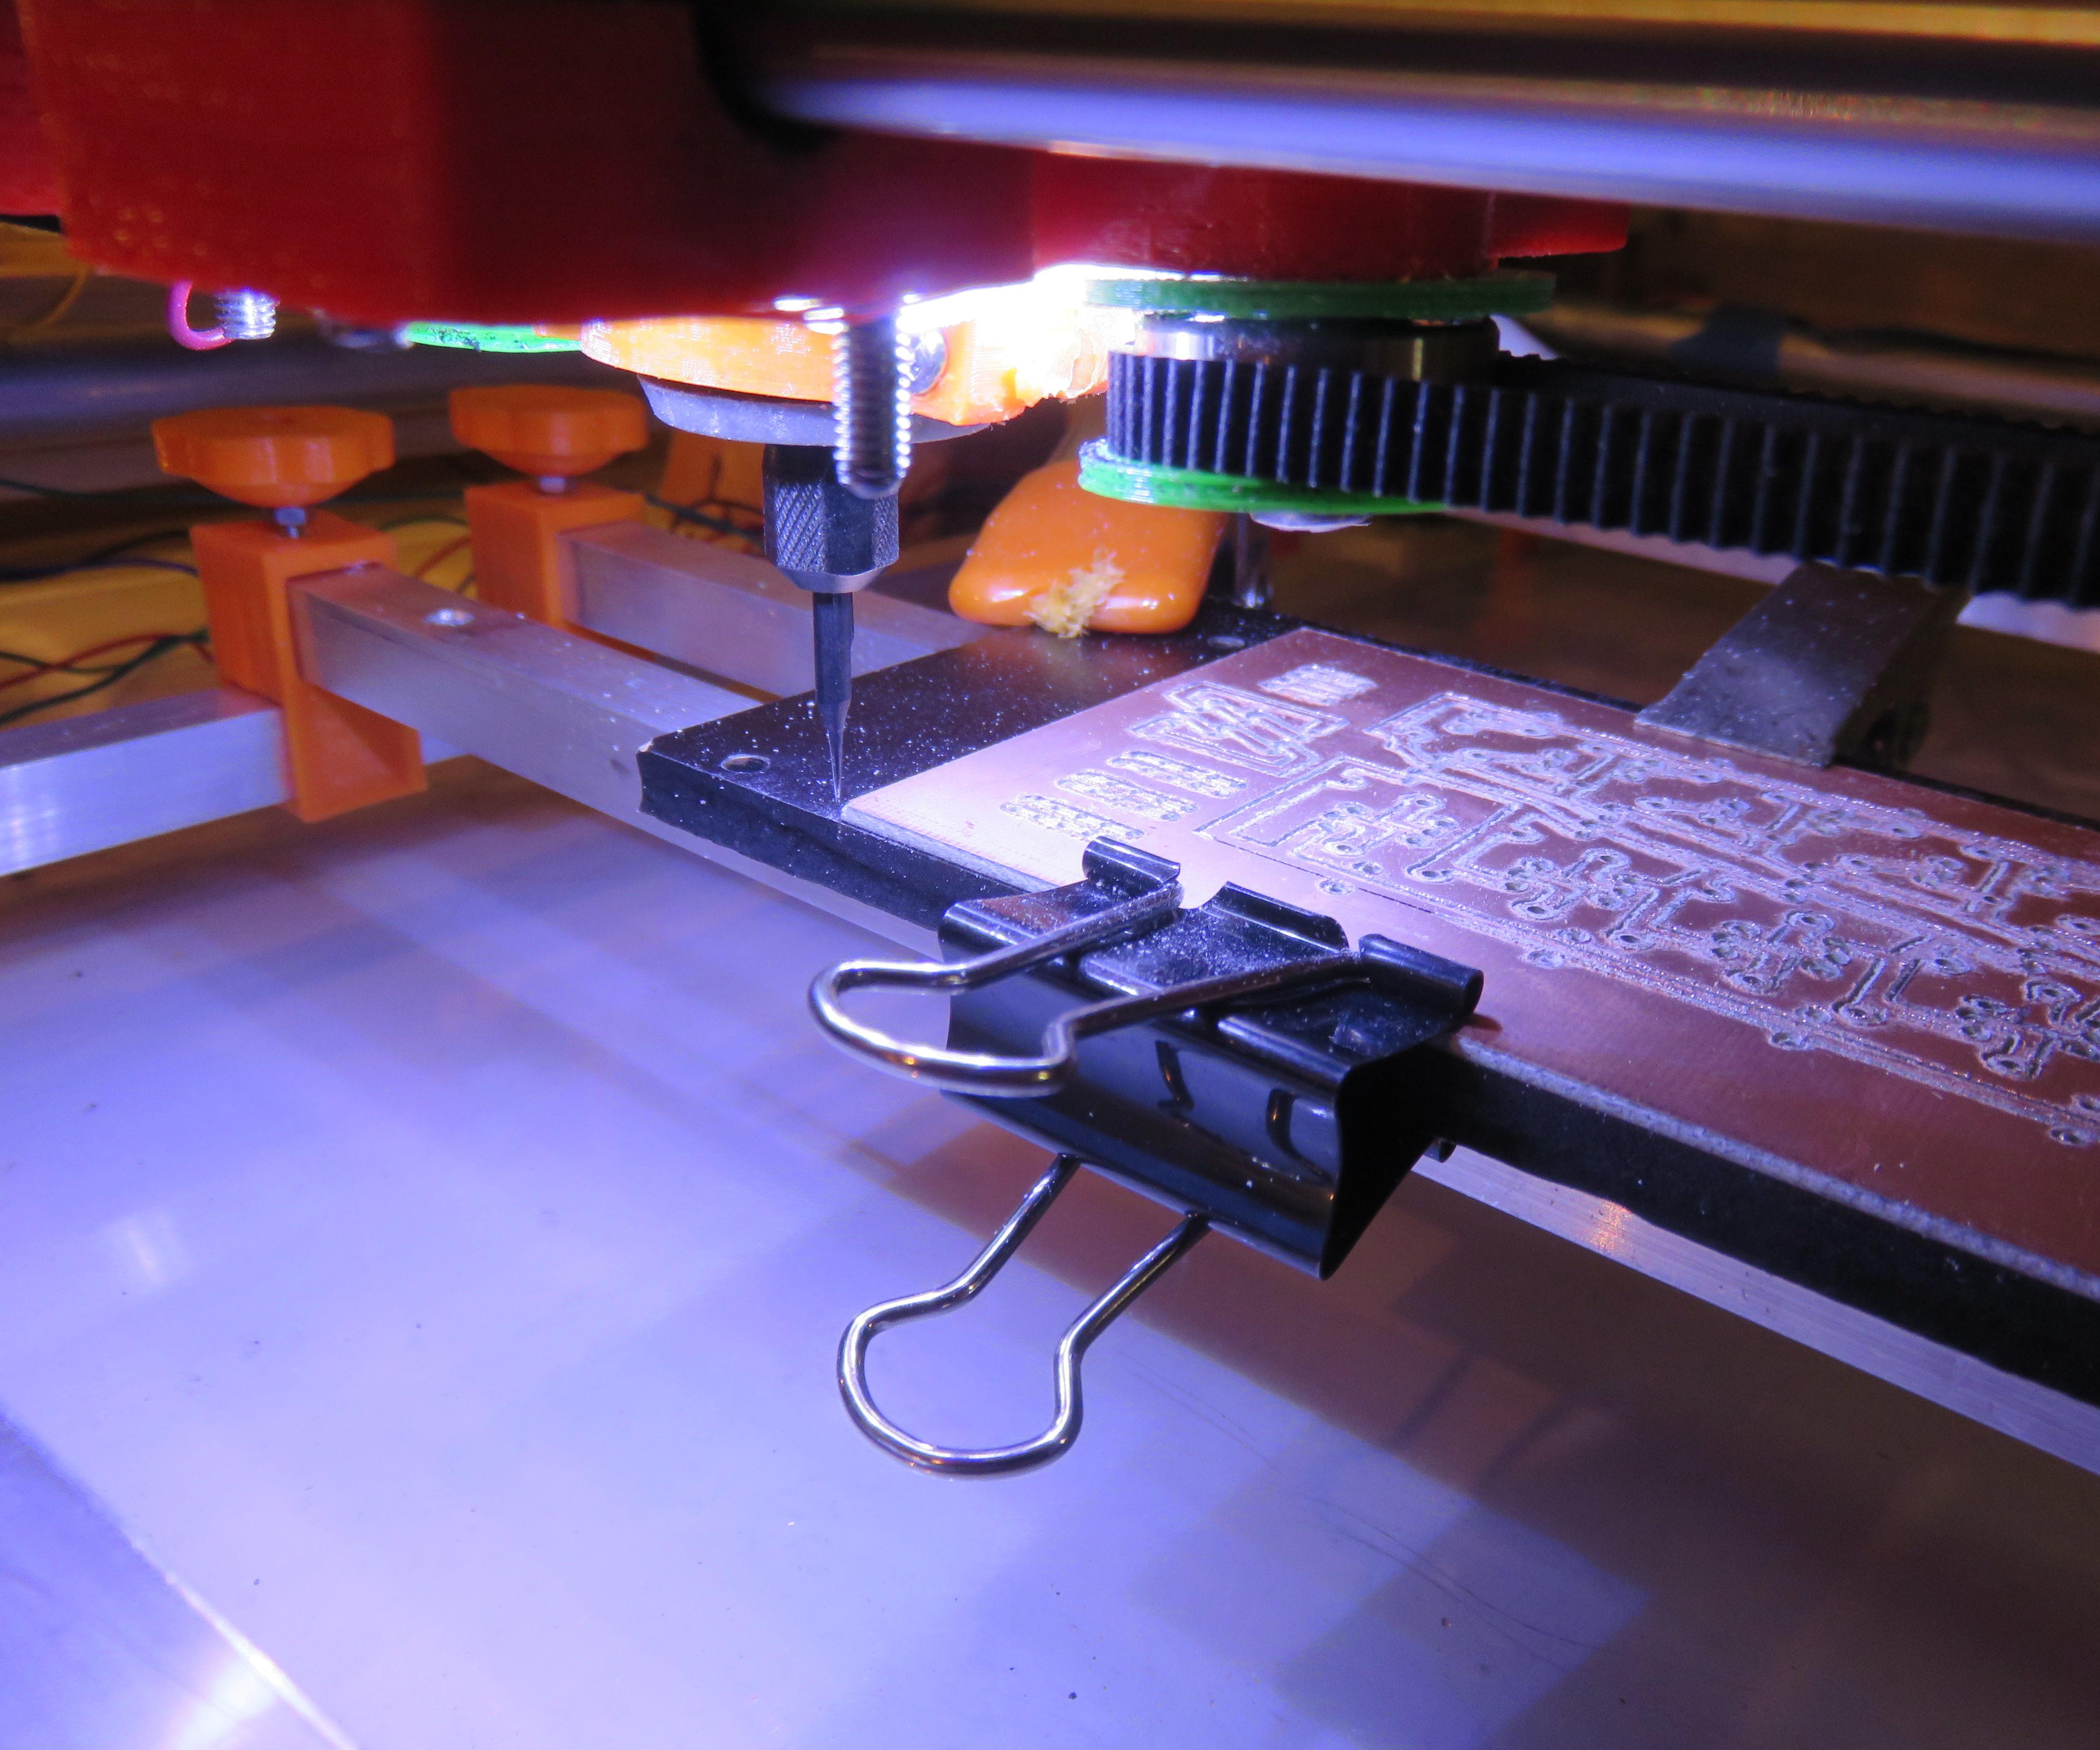 Modifying Makercam G Code